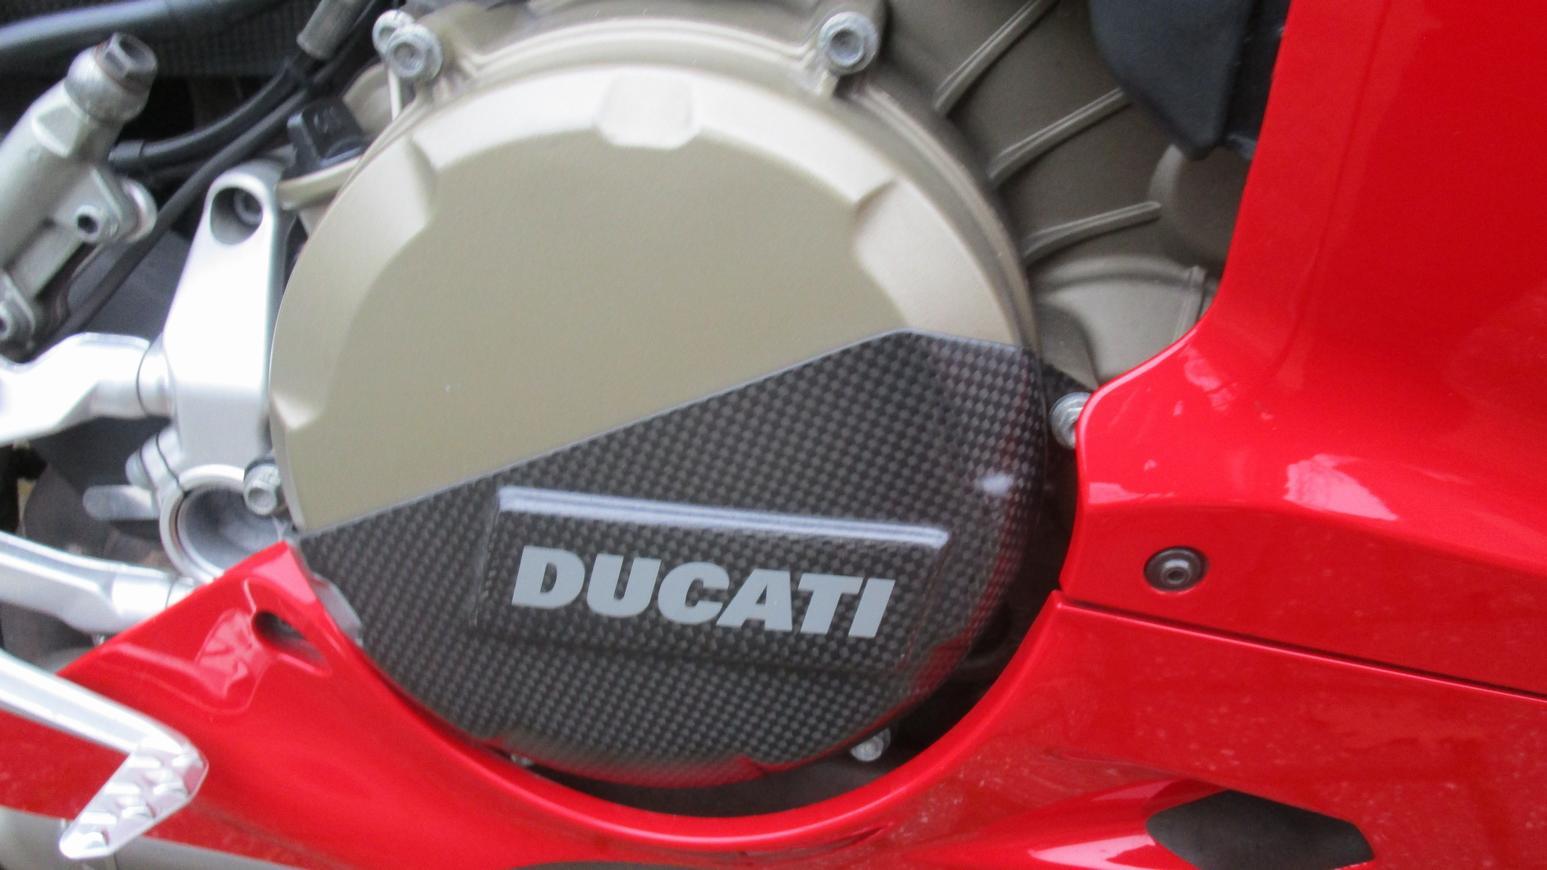 DUCATI - 1199 Panigale